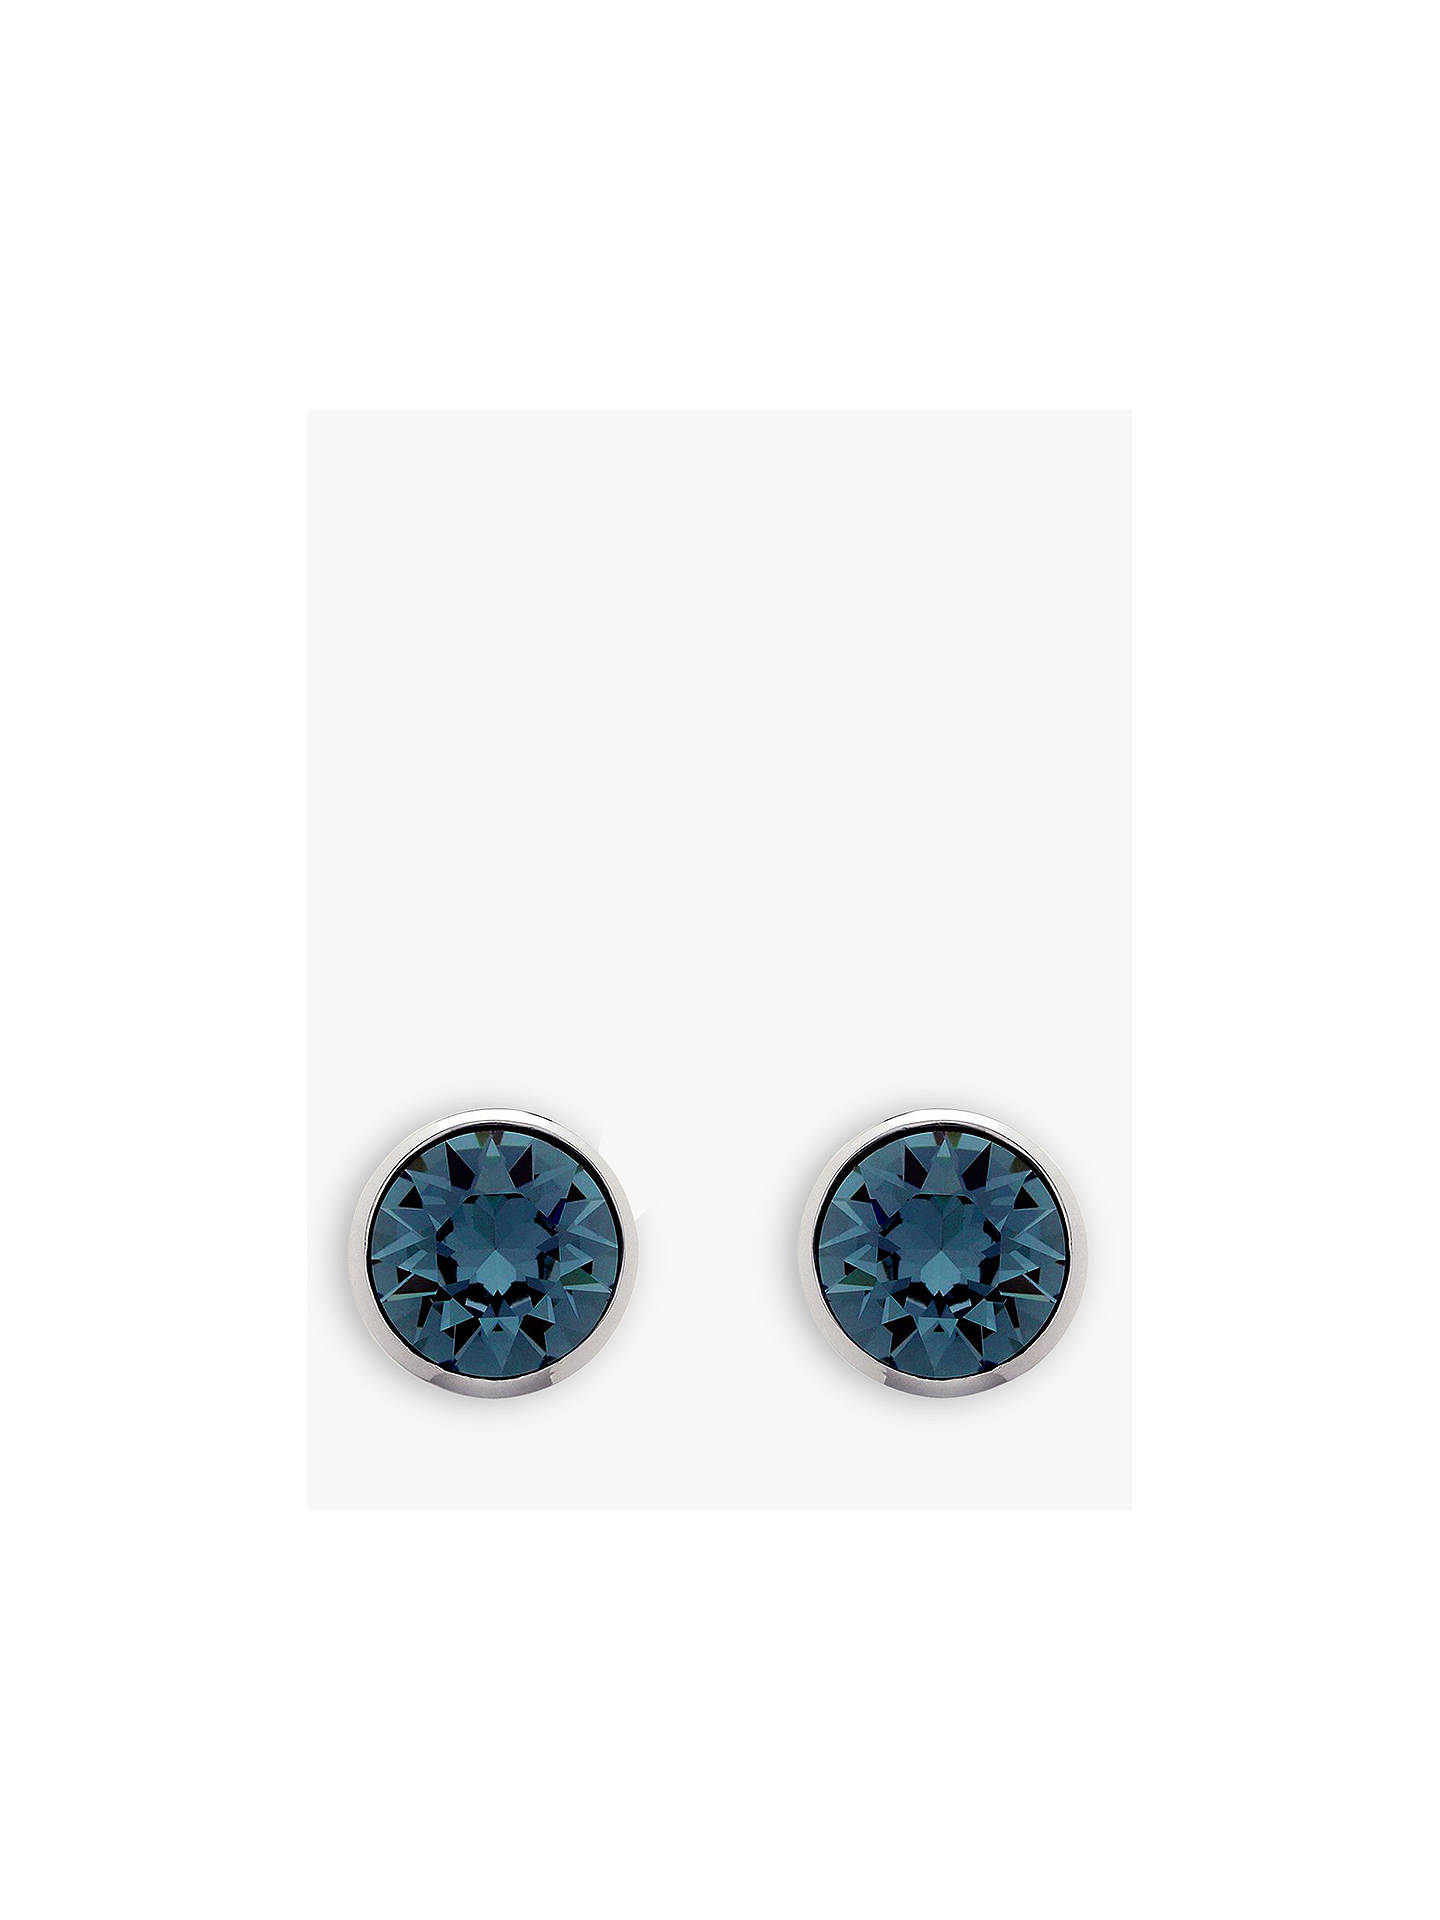 0a8647cb6 Buy Melissa Odabash Swarovski Crystal Stud Earrings, Dark Blue/Silver  Online at johnlewis.